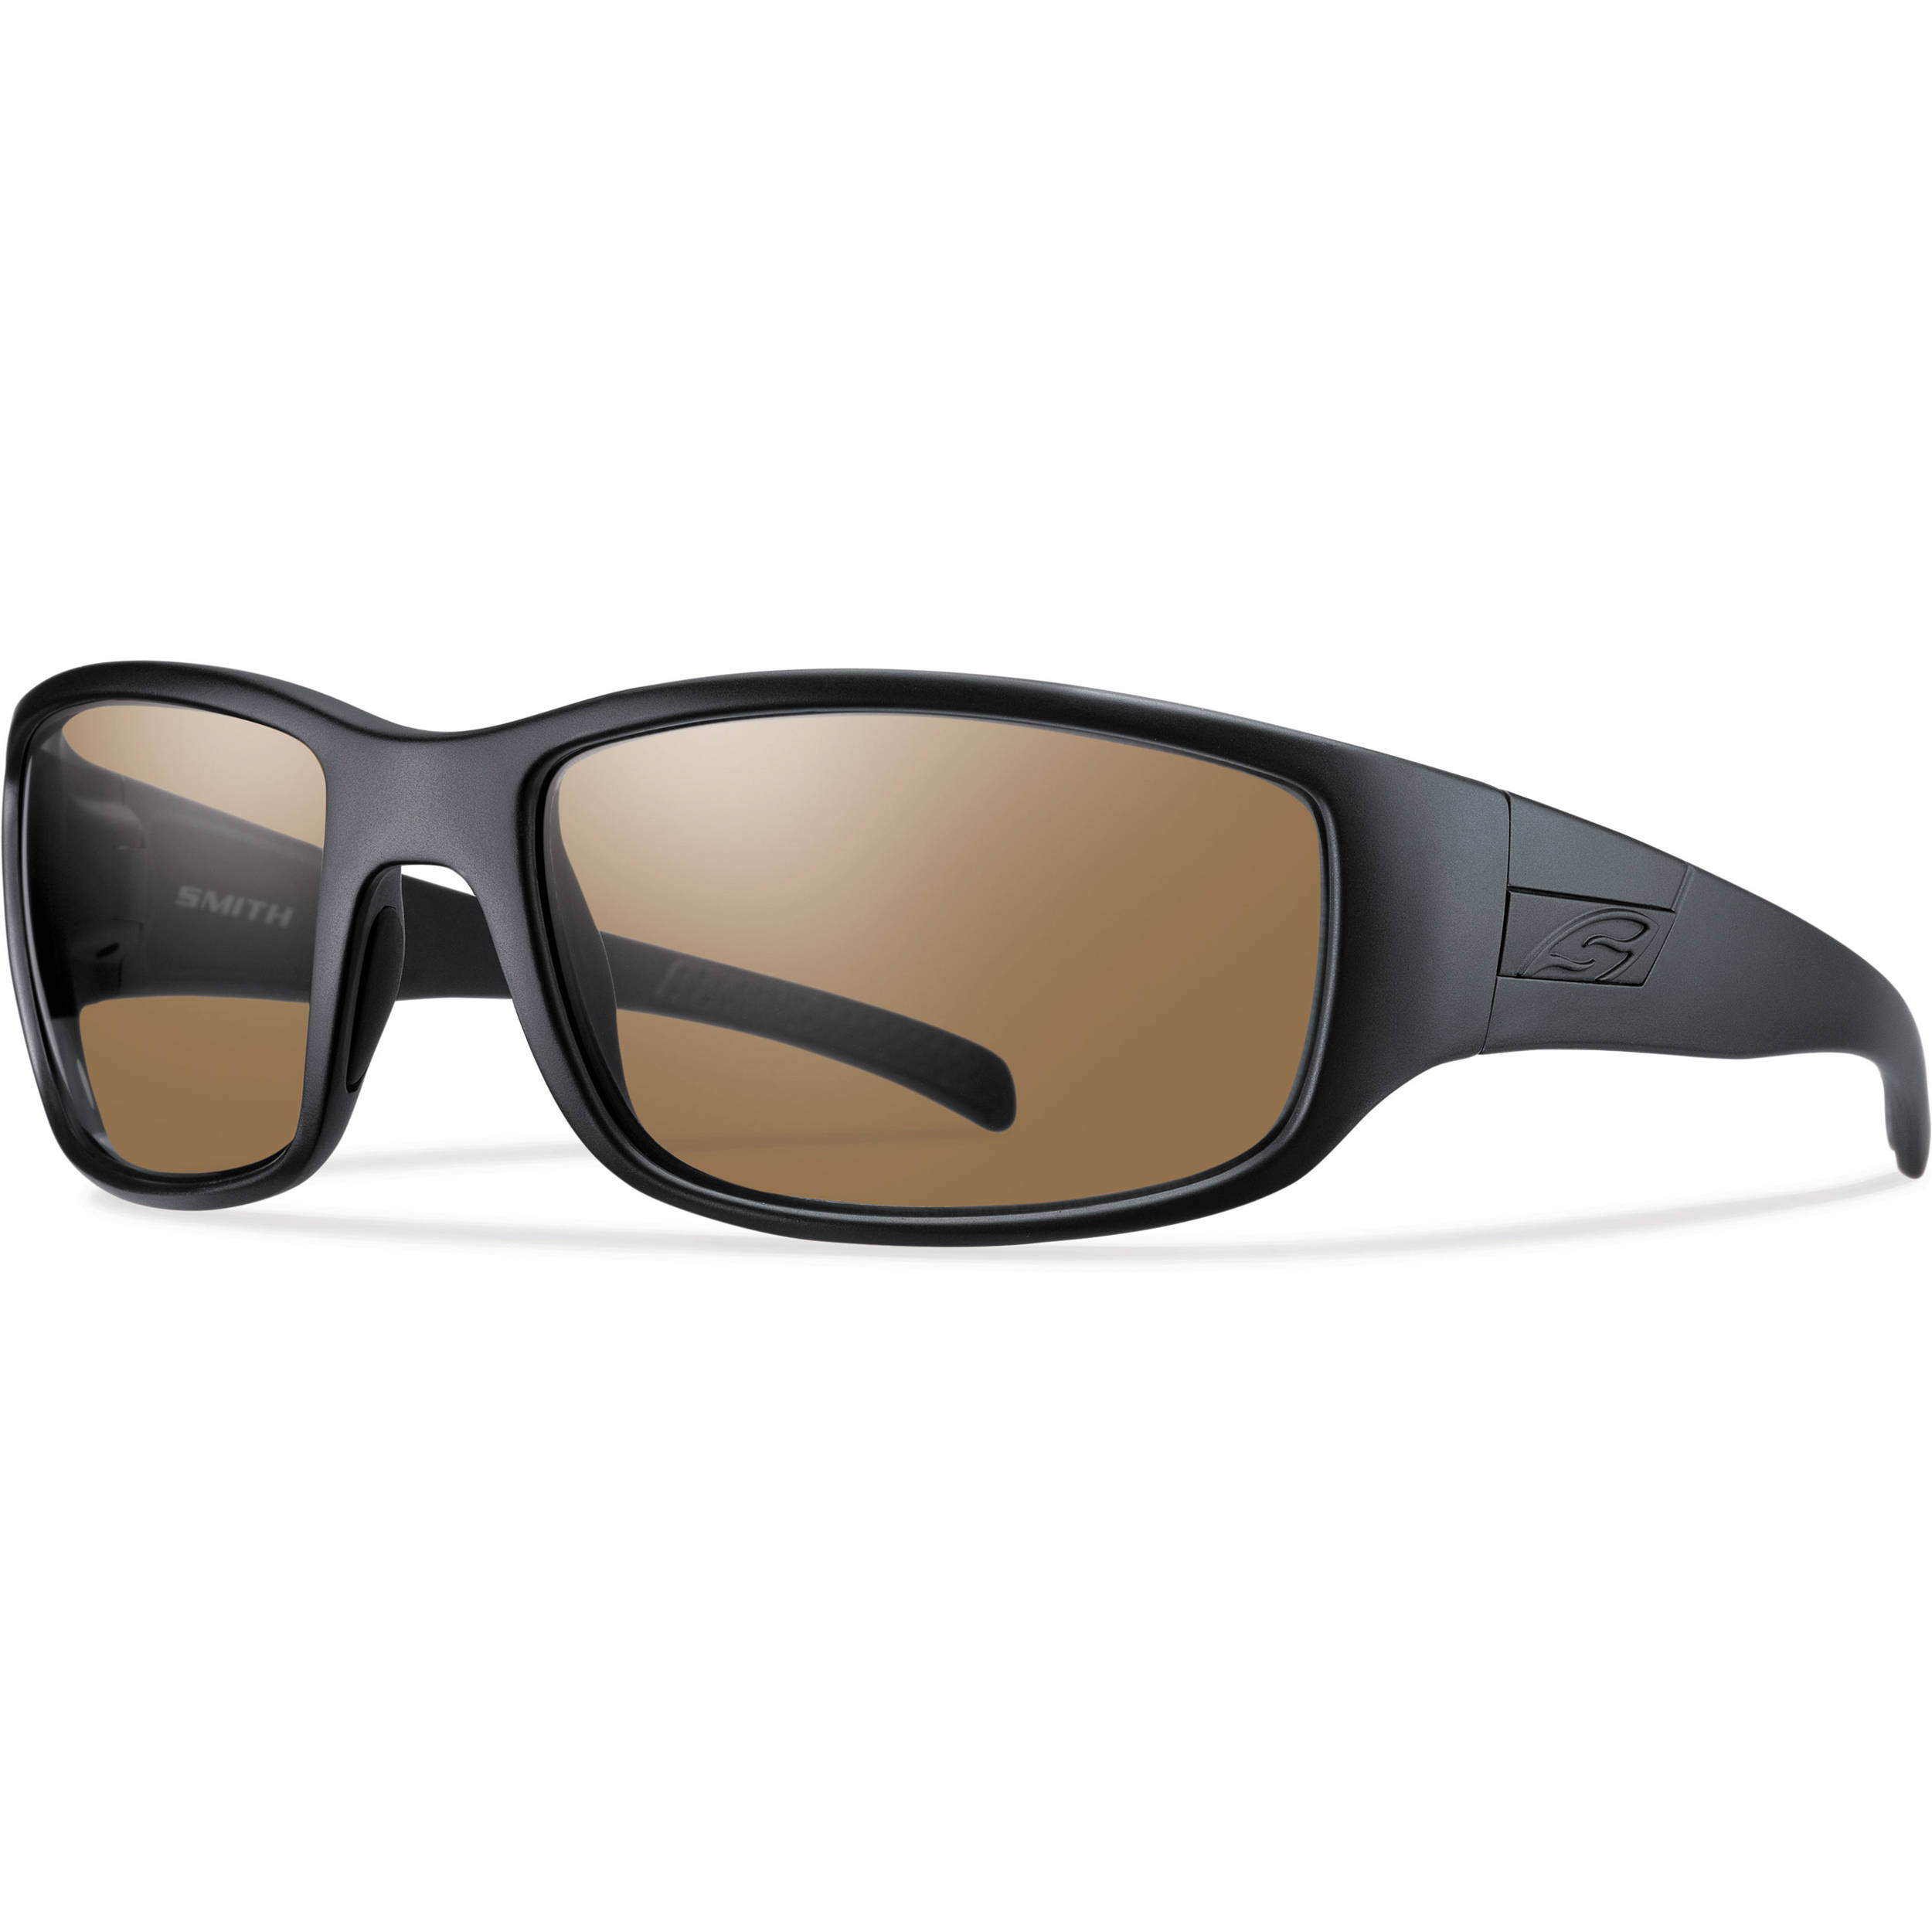 27fd62757d Smith Optics Prospect Sunglasses - Polarized Chromapop Lenses ...